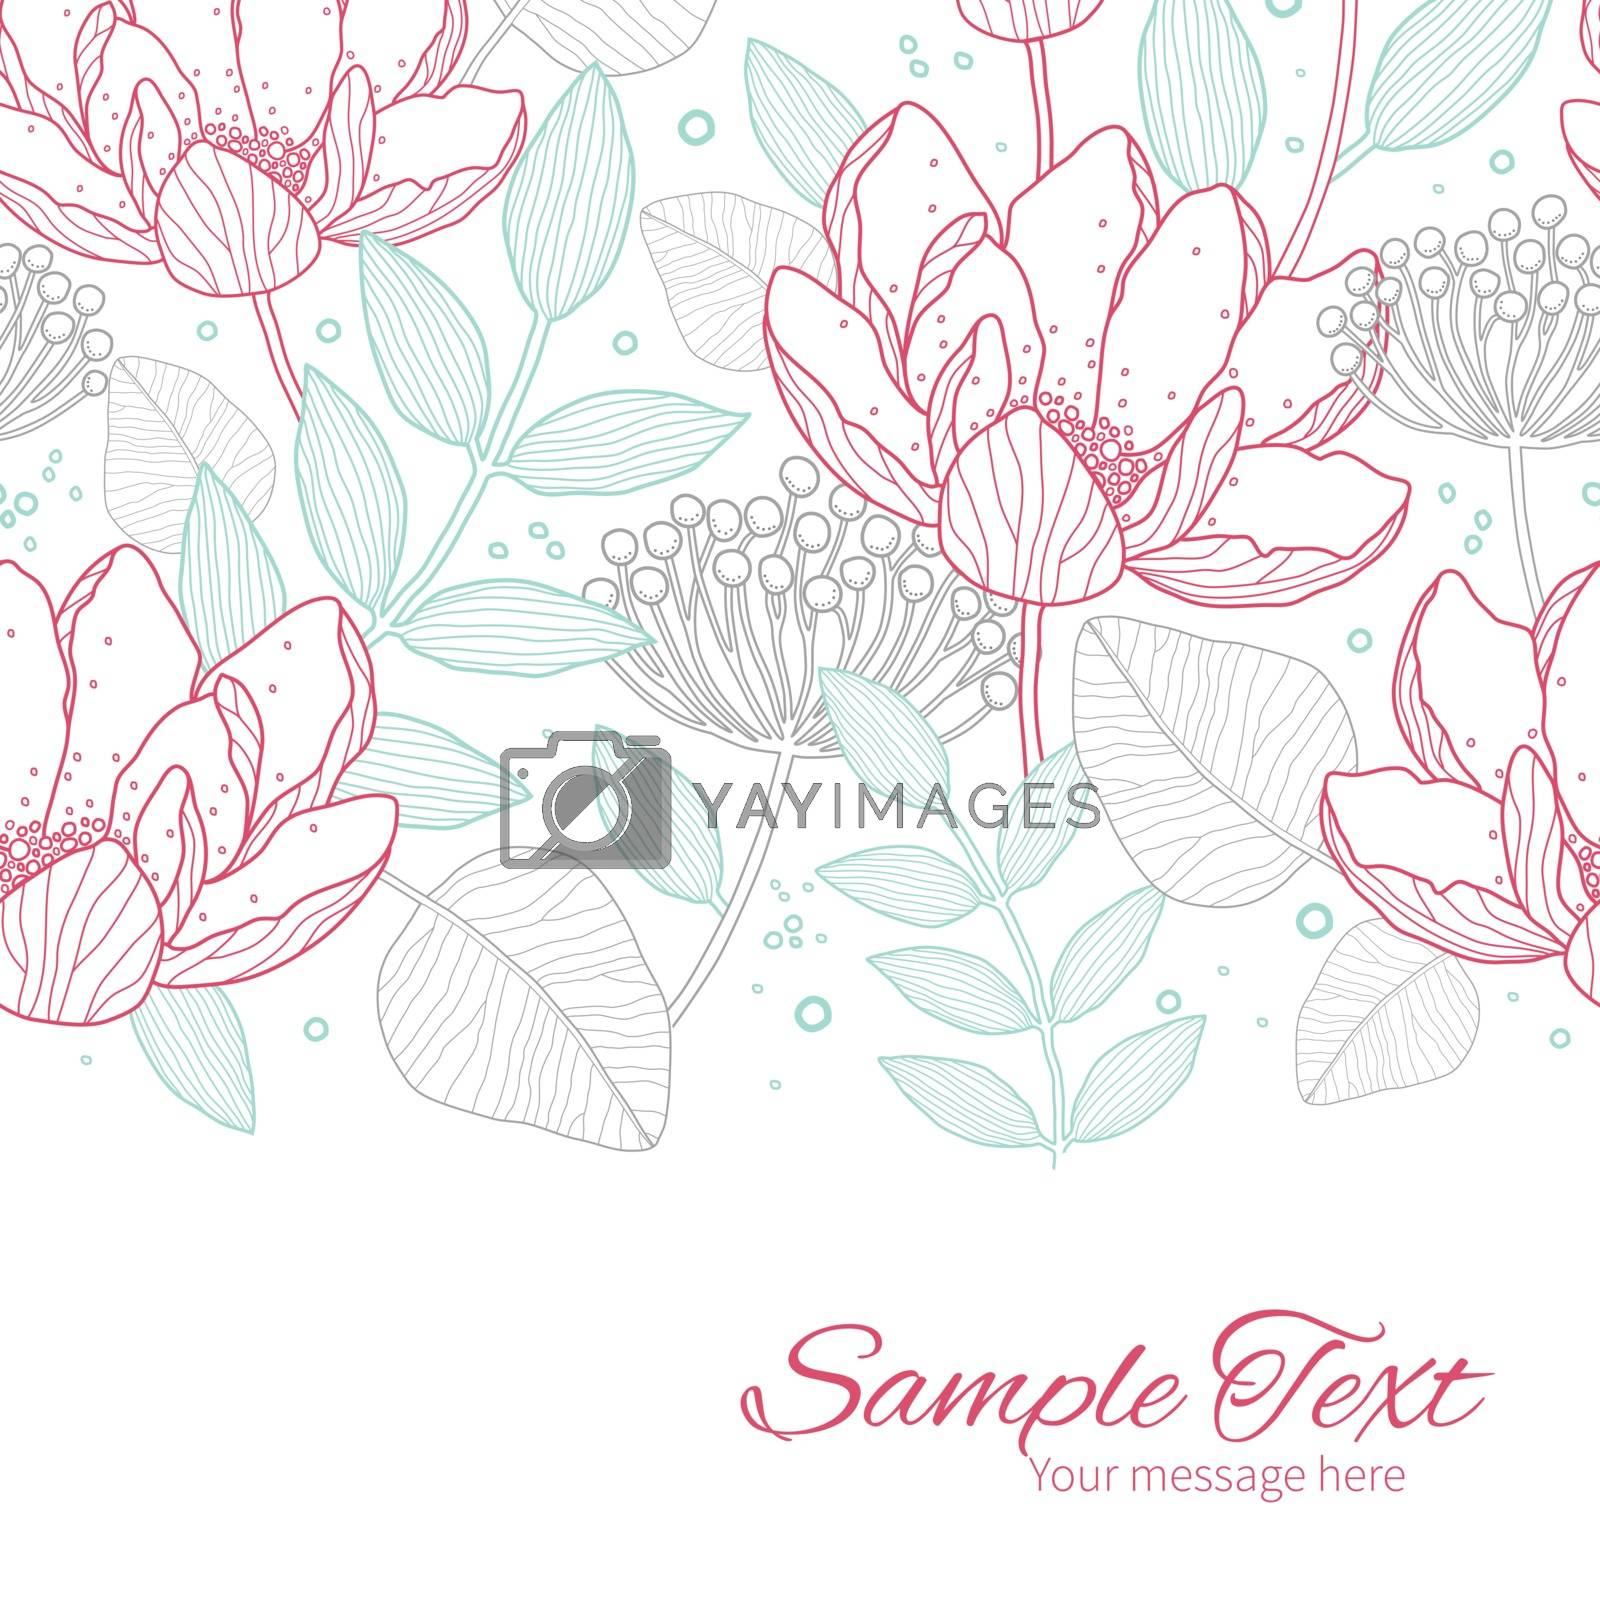 Vector modern line art florals horizontal border card template graphic design